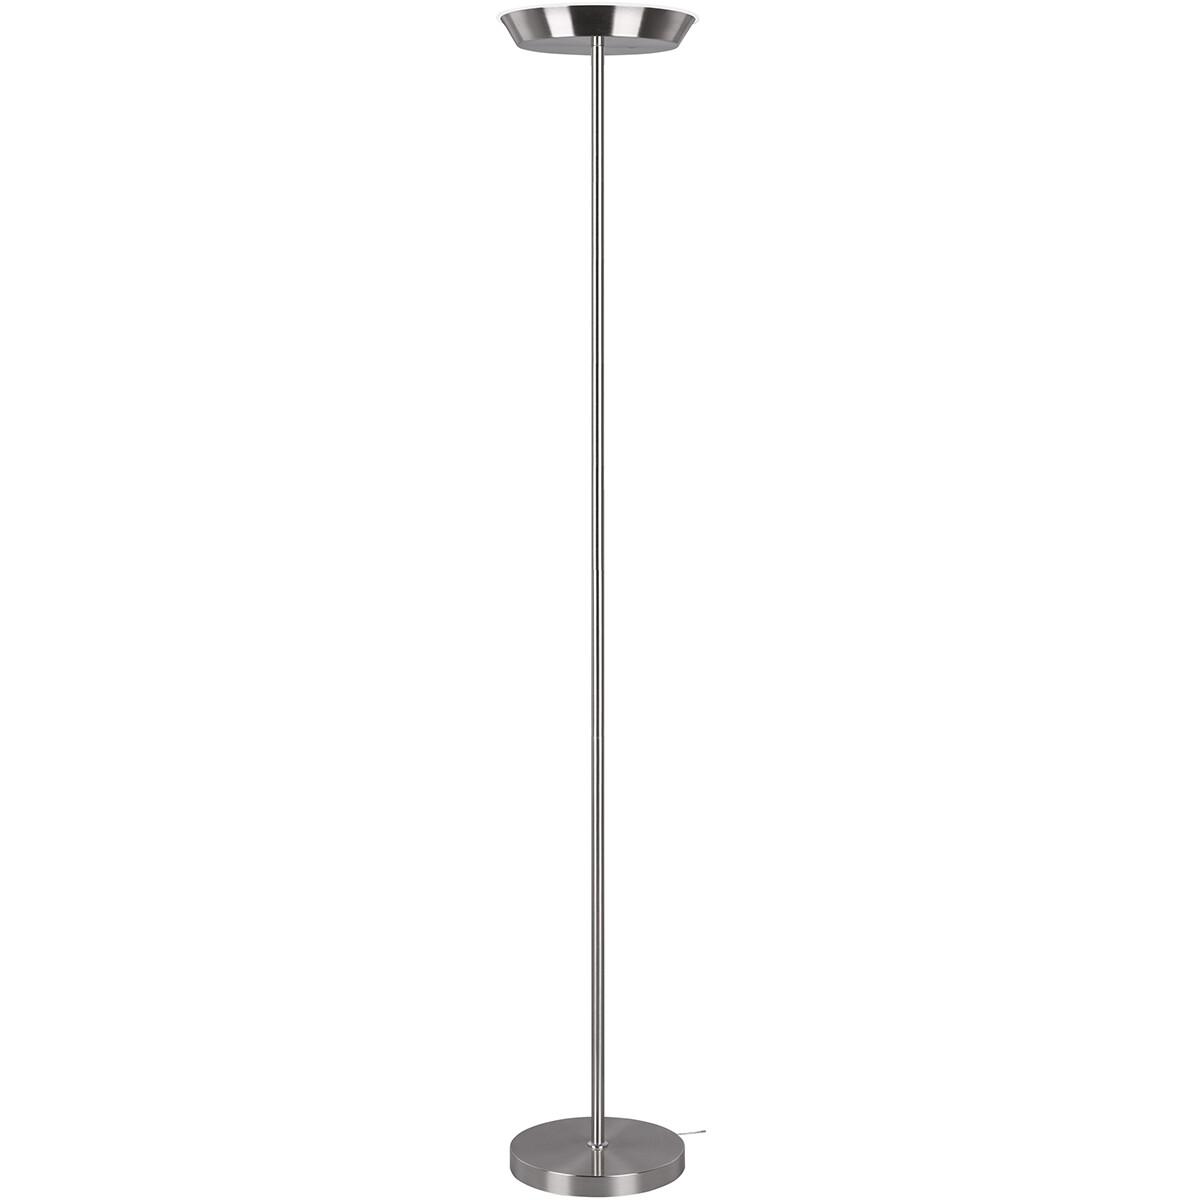 LED Vloerlamp WiZ - Smart LED - Trion Swani - 18W - Aanpasbare Kleur - Dimbaar - Rond - Mat Nikkel -